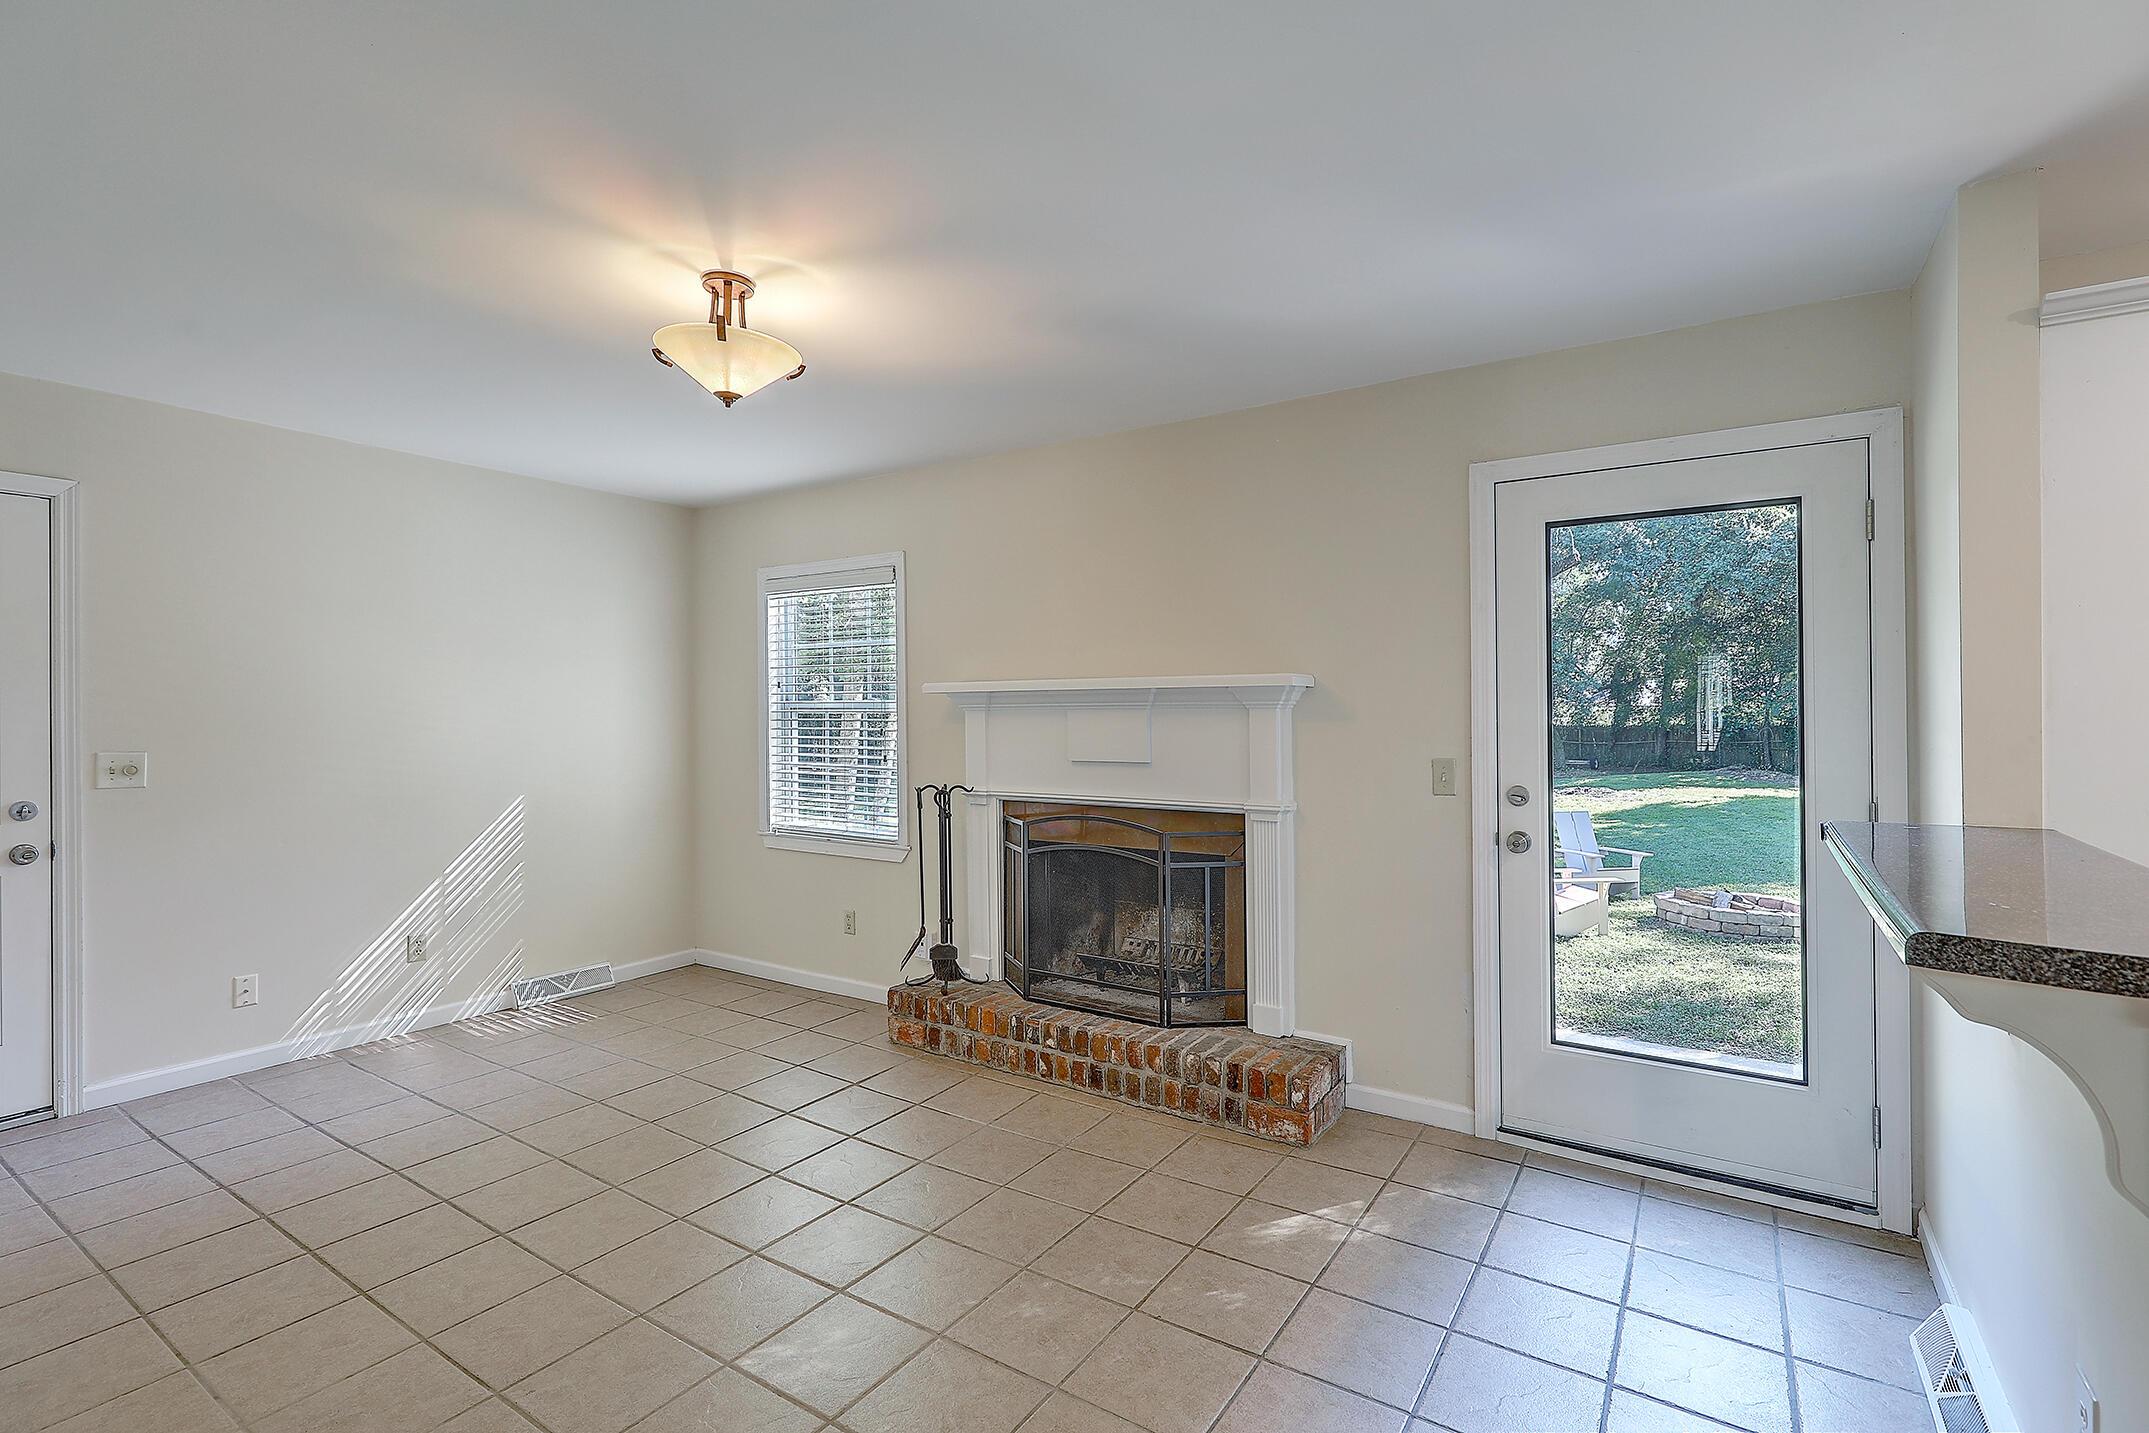 Cooper Estates Homes For Sale - 901 Searle, Mount Pleasant, SC - 19